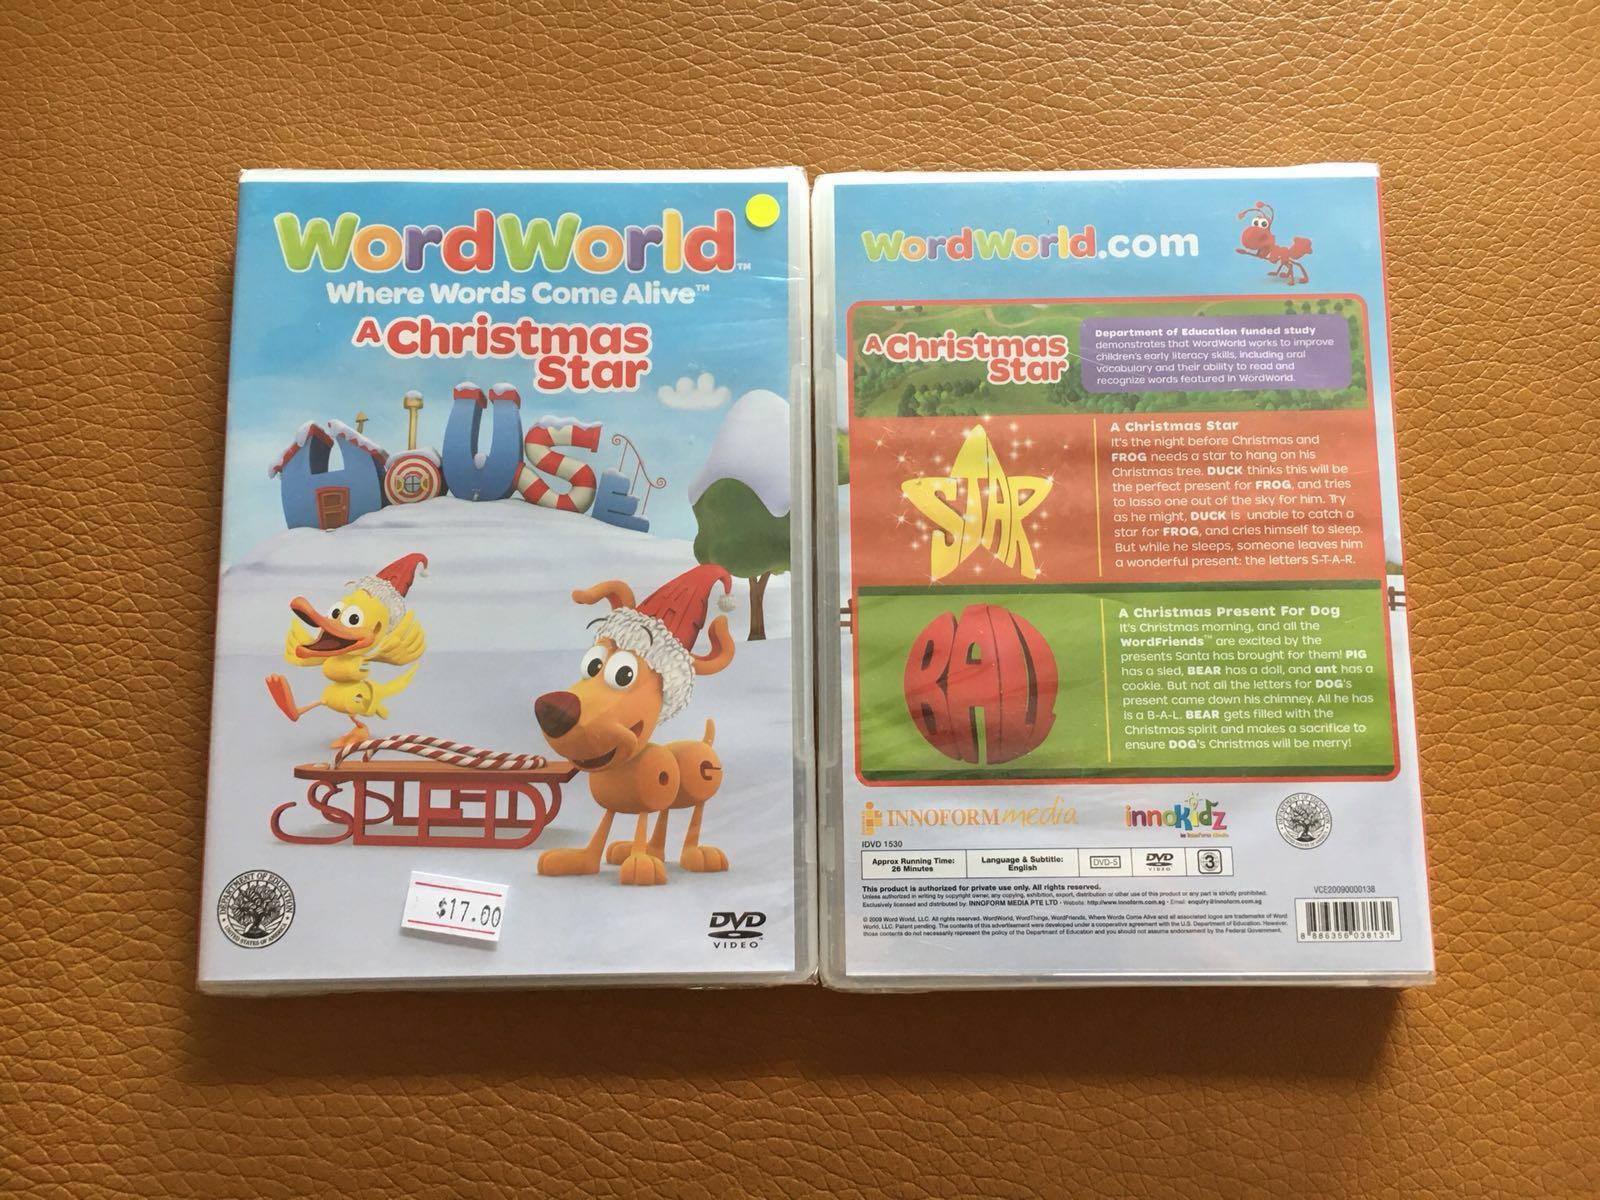 Catch A Christmas Star Dvd.New Word World A Christmas Star Music Media Cds Dvds